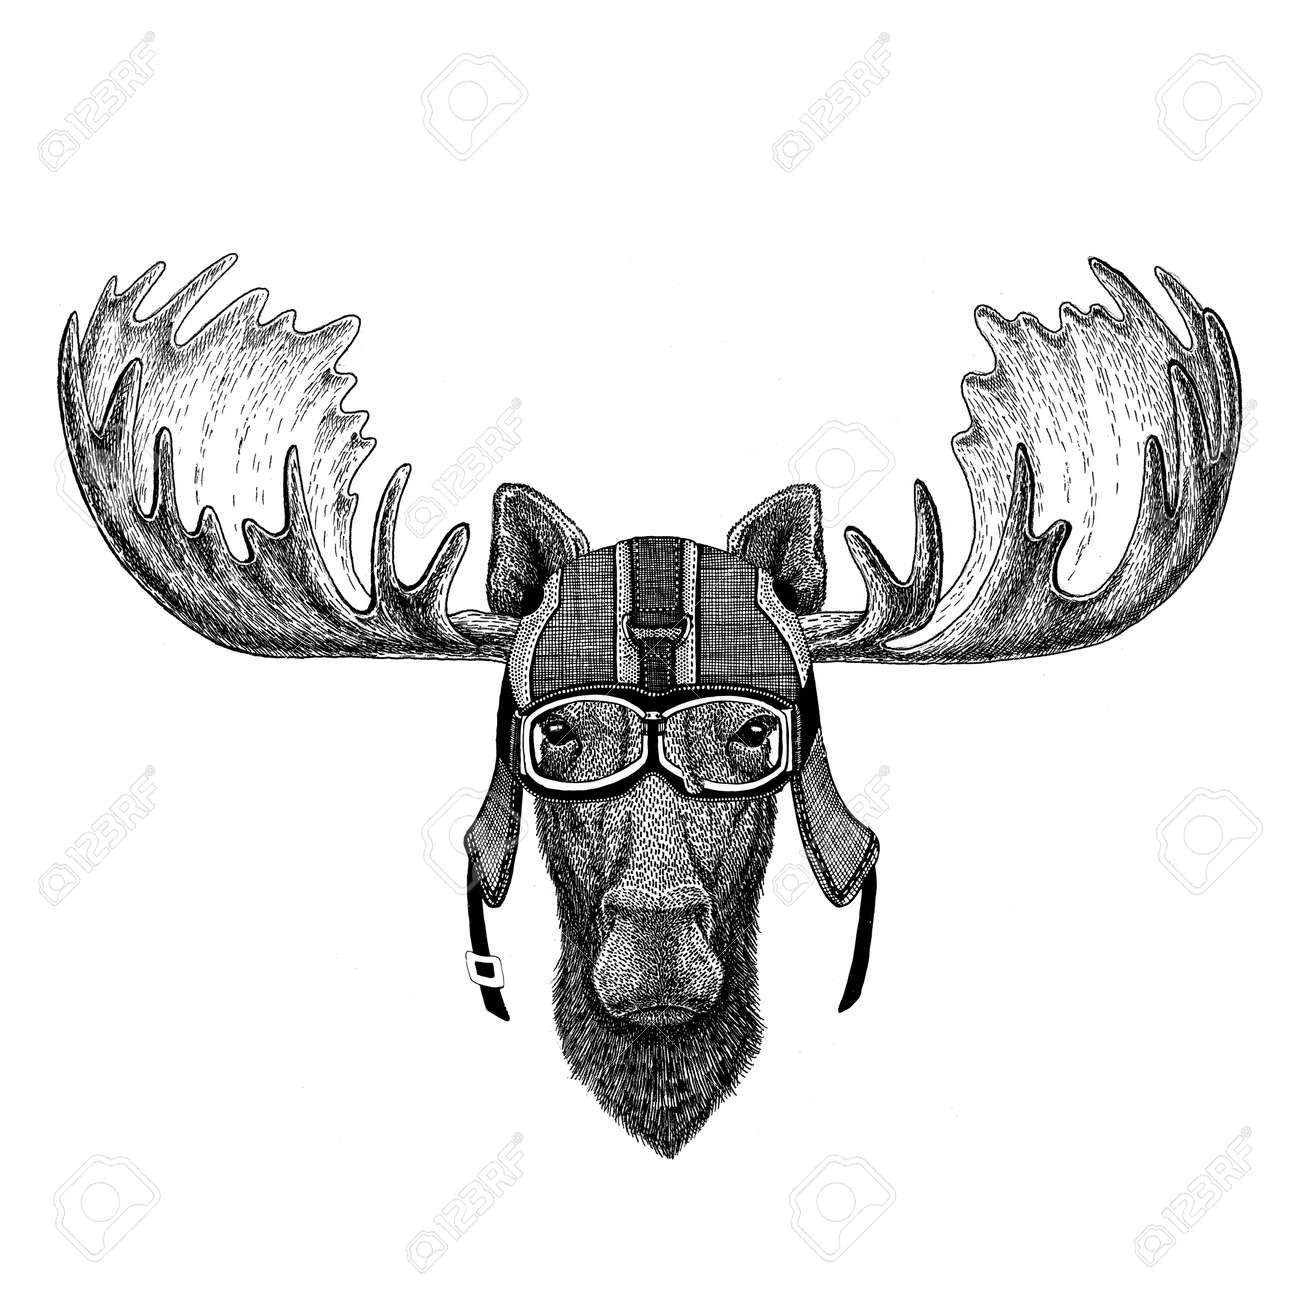 Moose, elk wearing motorcycle helmet, aviator helmet Illustration for t-shirt, patch, logo, badge, emblem, logotype Biker t-shirt with wild animal - 82012772